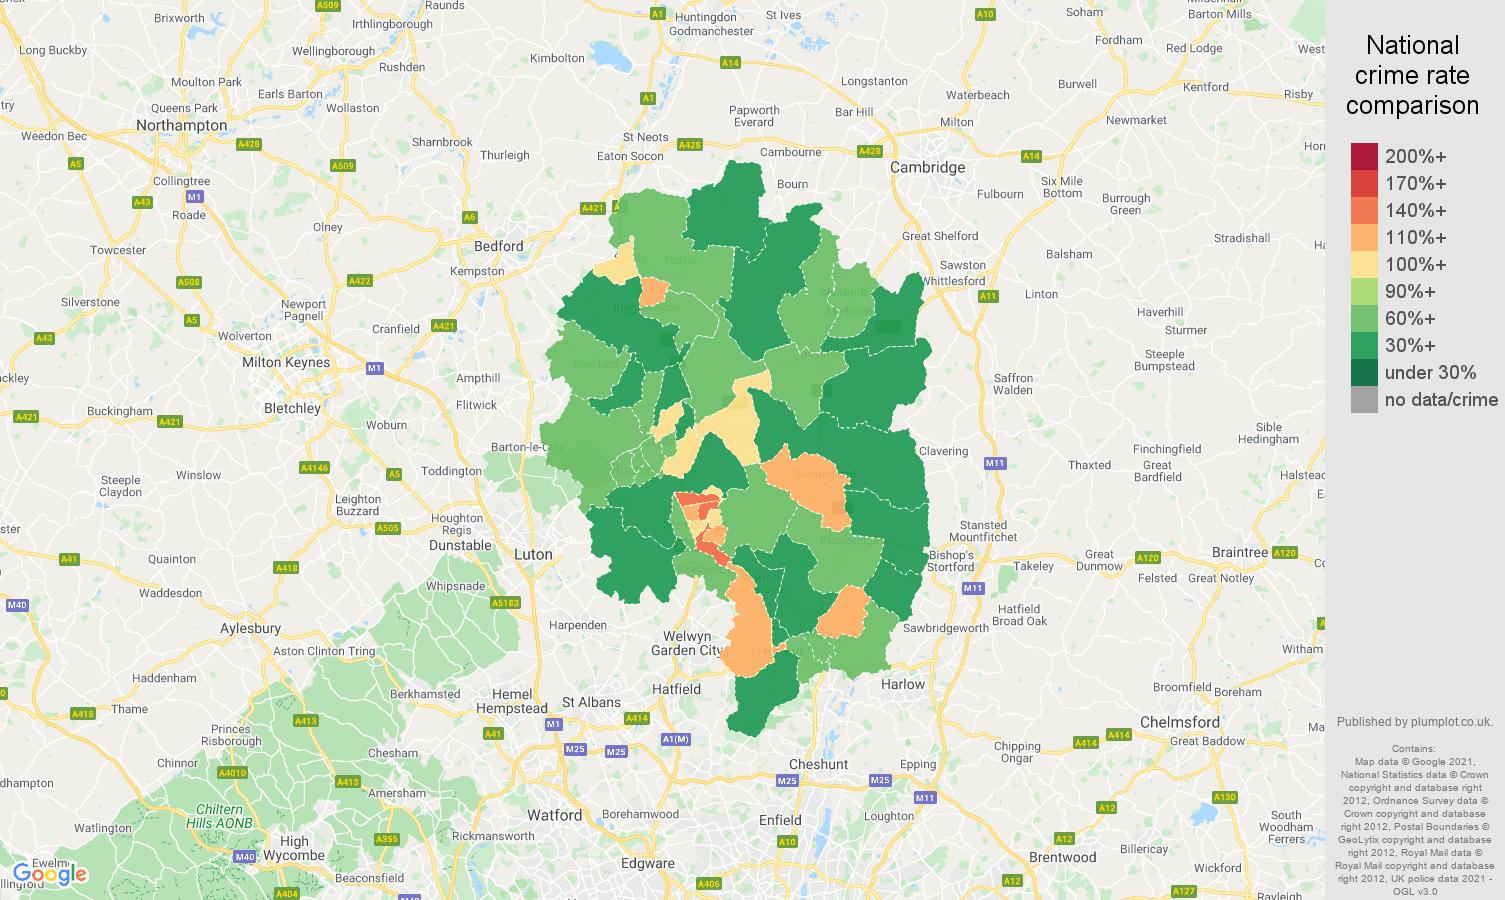 Stevenage violent crime rate comparison map